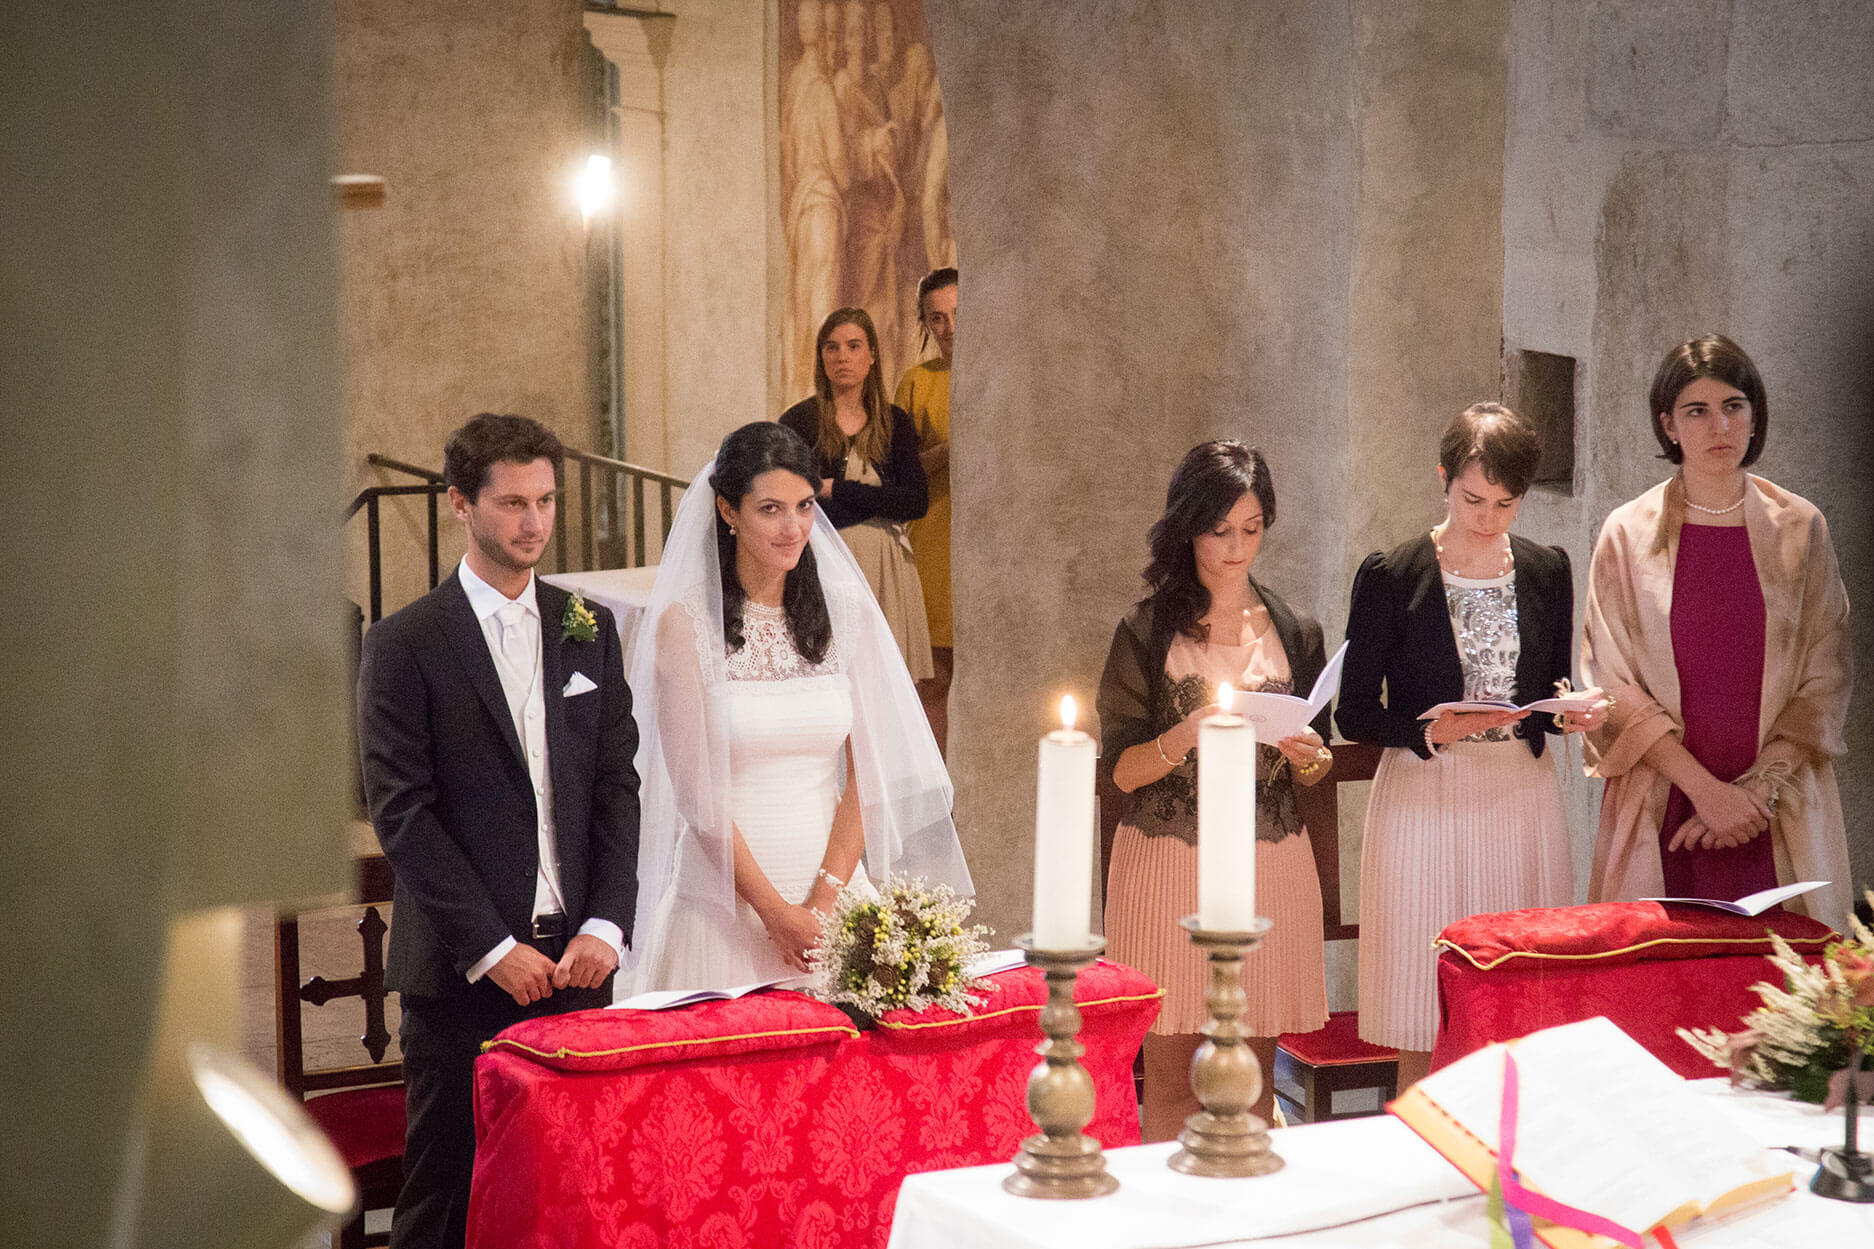 Francesca-Ferrati-wedding-photographer-Verona-Elena-Tommaso10